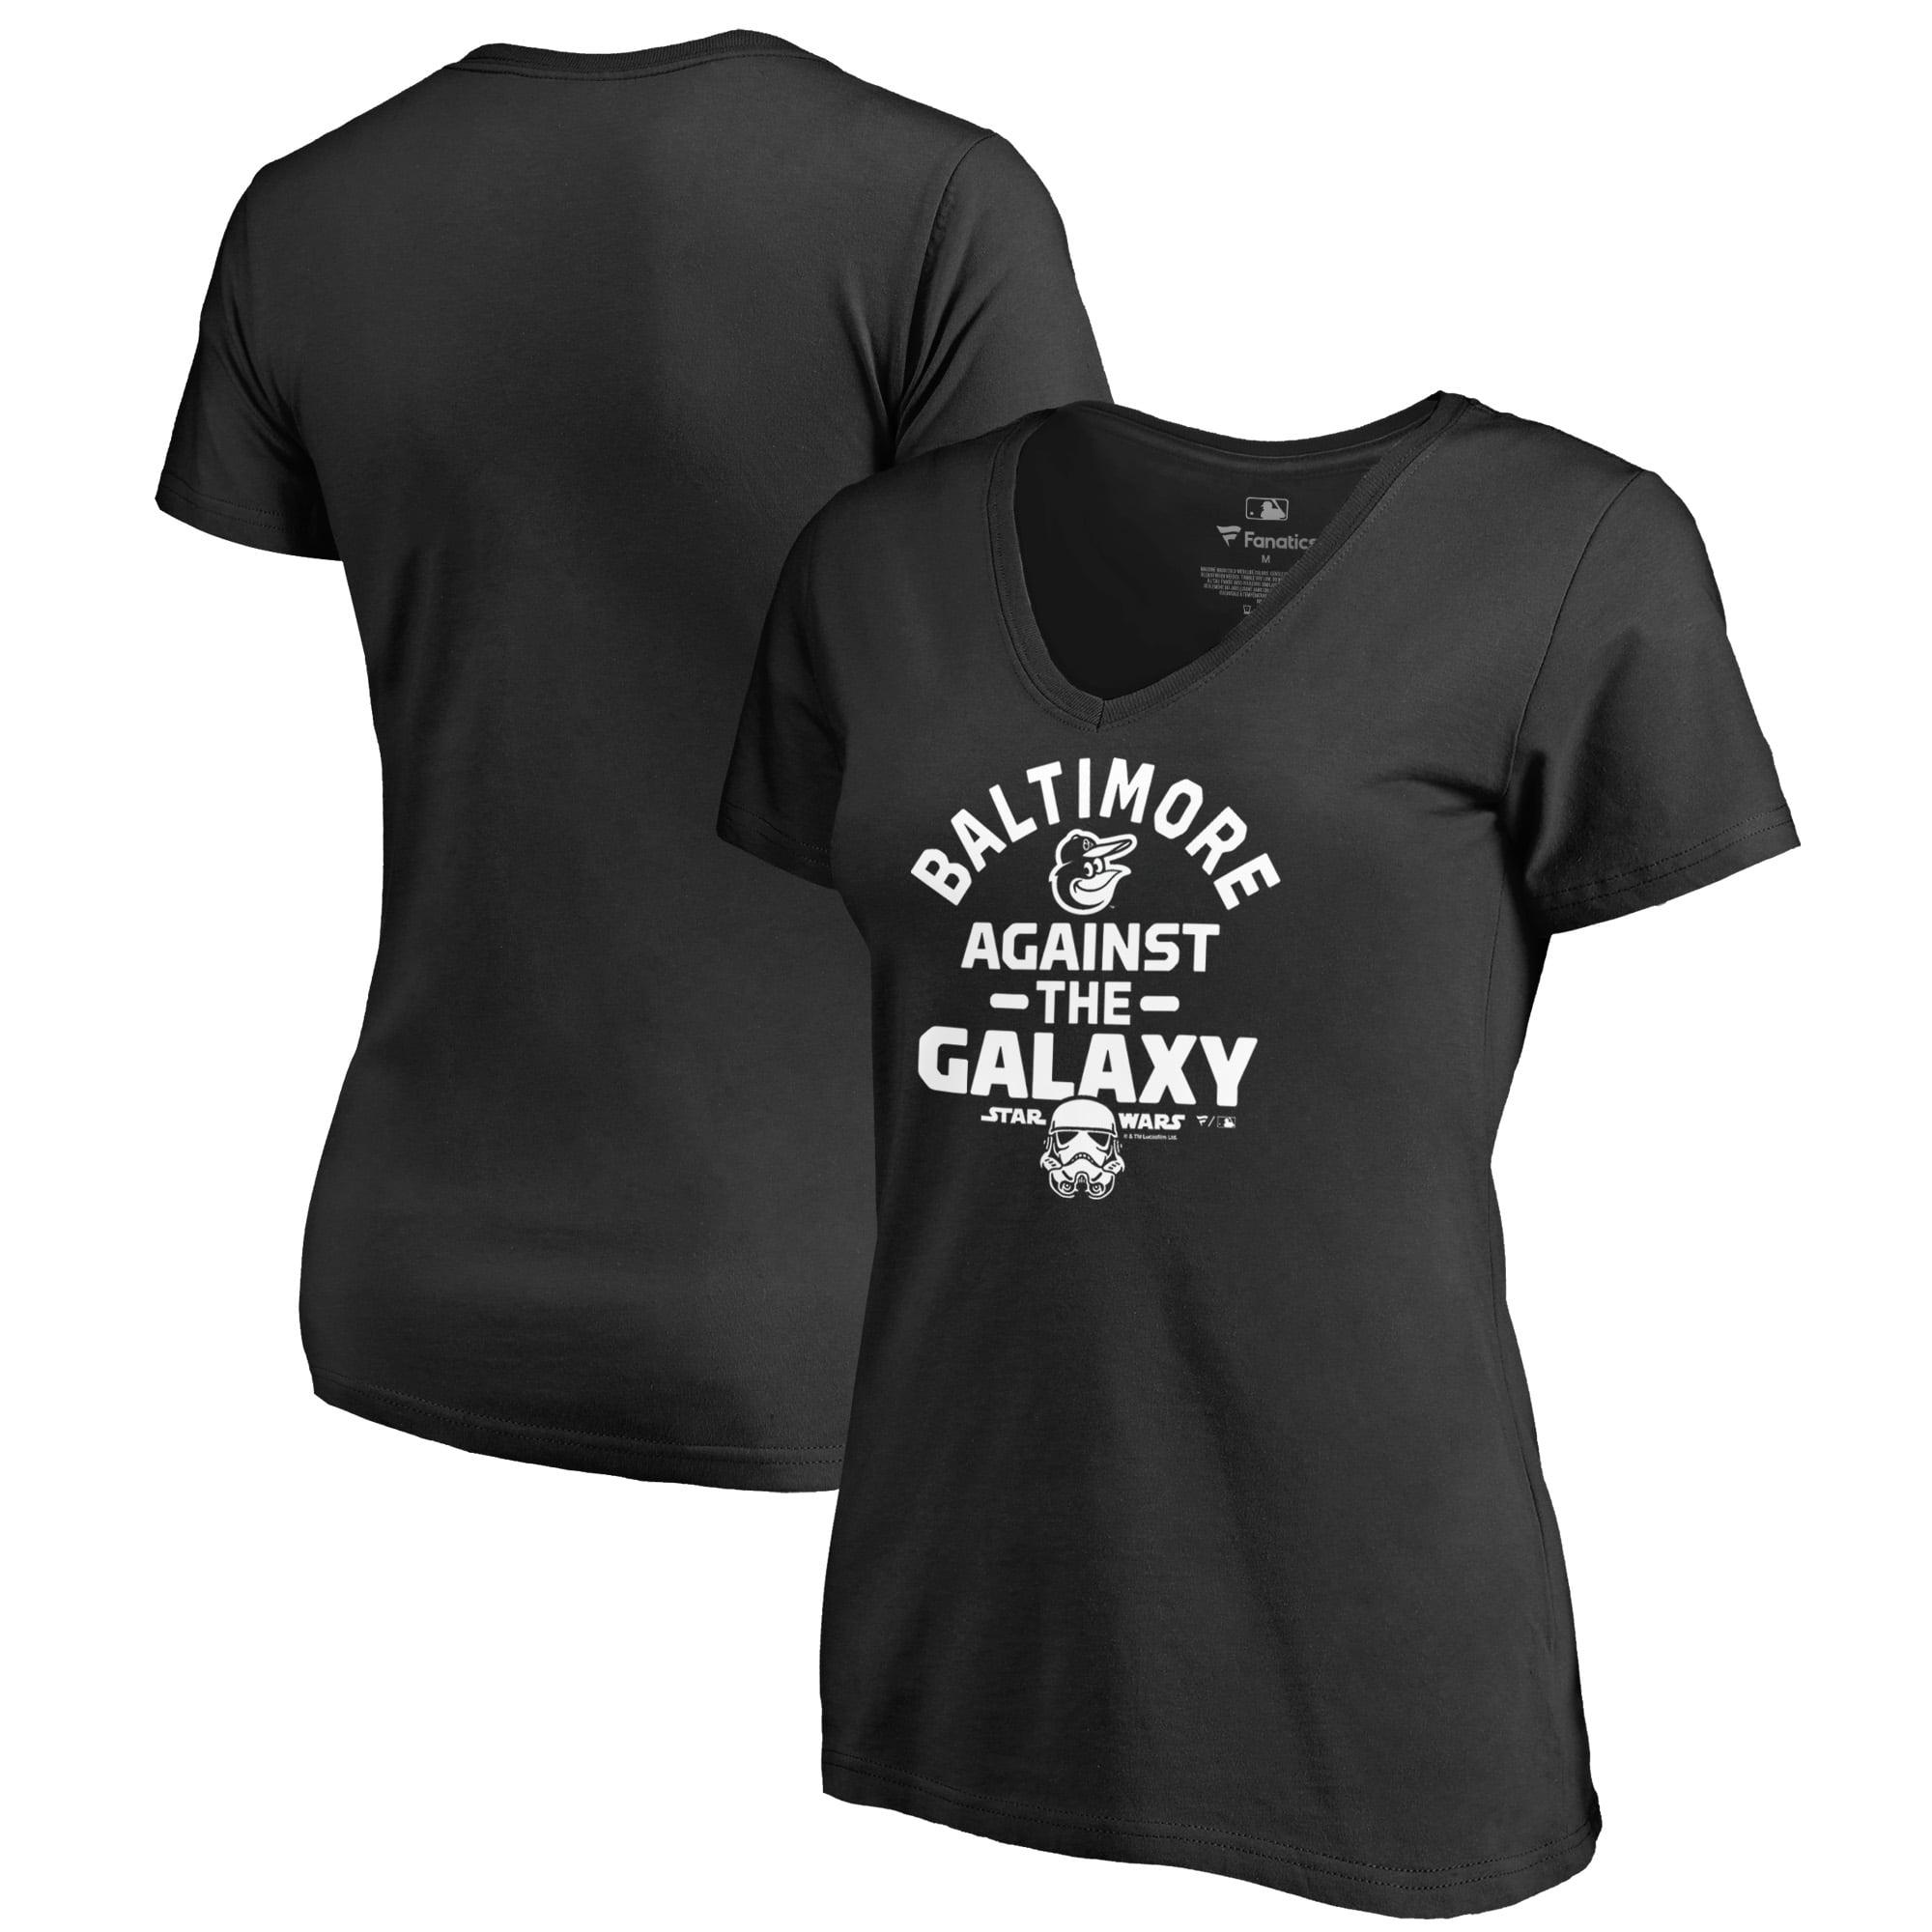 Baltimore Orioles Fanatics Branded Women's MLB Star Wars Against The Galaxy V-Neck T-Shirt - Black